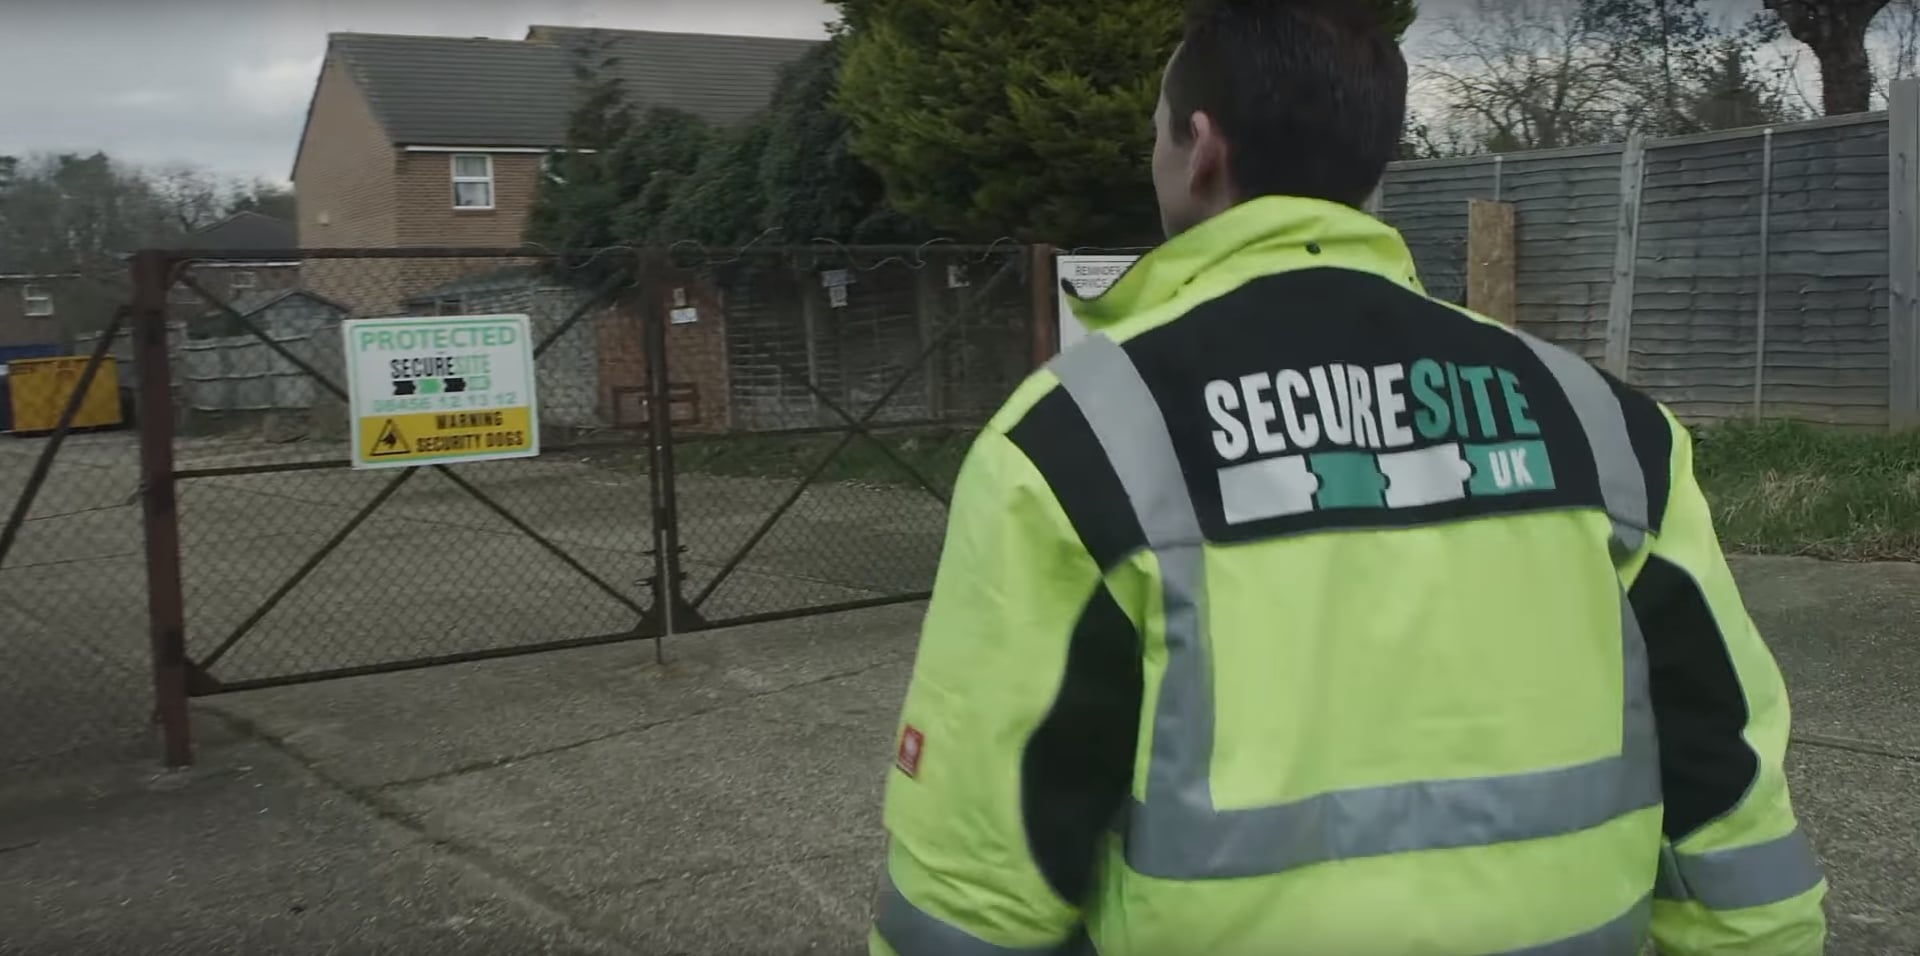 Secure Site UK security guard